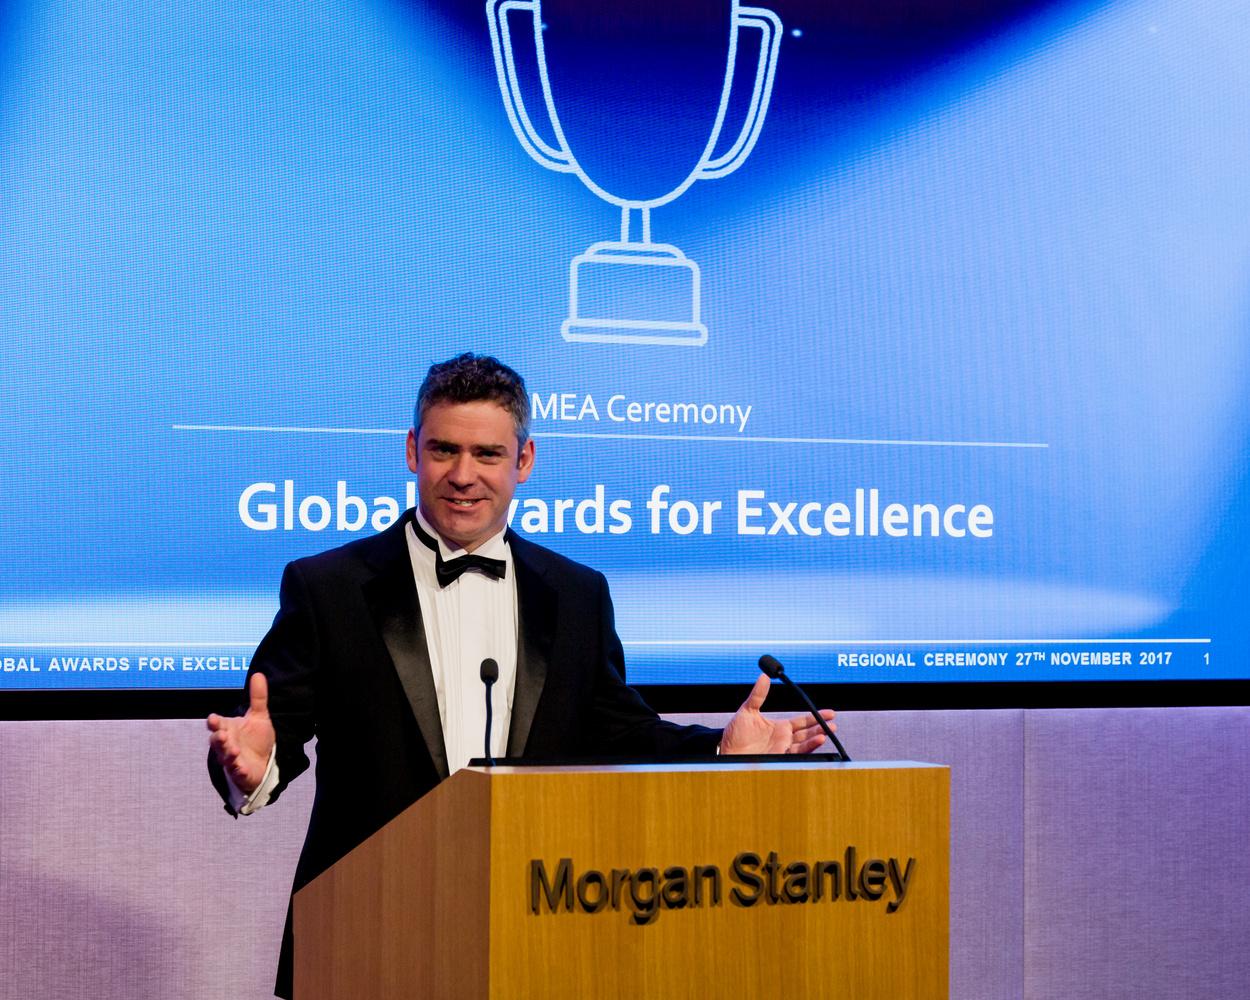 Corporate Awards Ceremony Speaker by James Barton